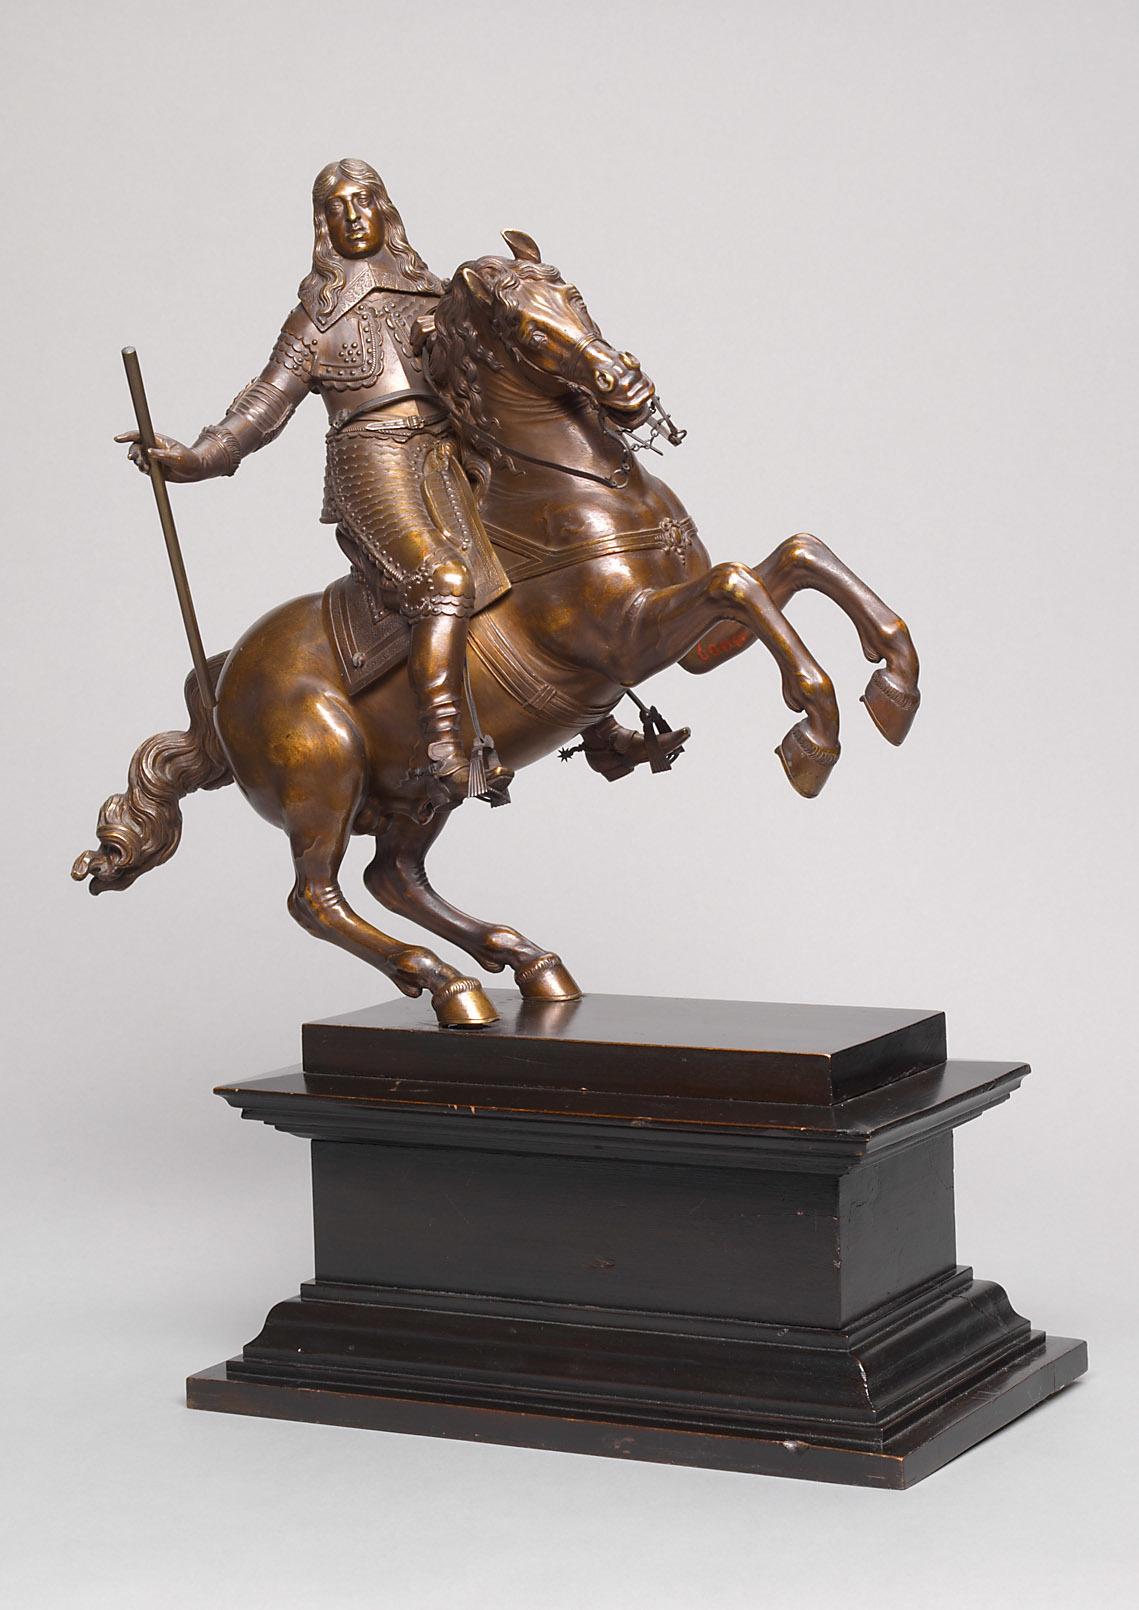 Archduke Leopold, later Emperor Leopold I, 1600-1658, Caspar Gras